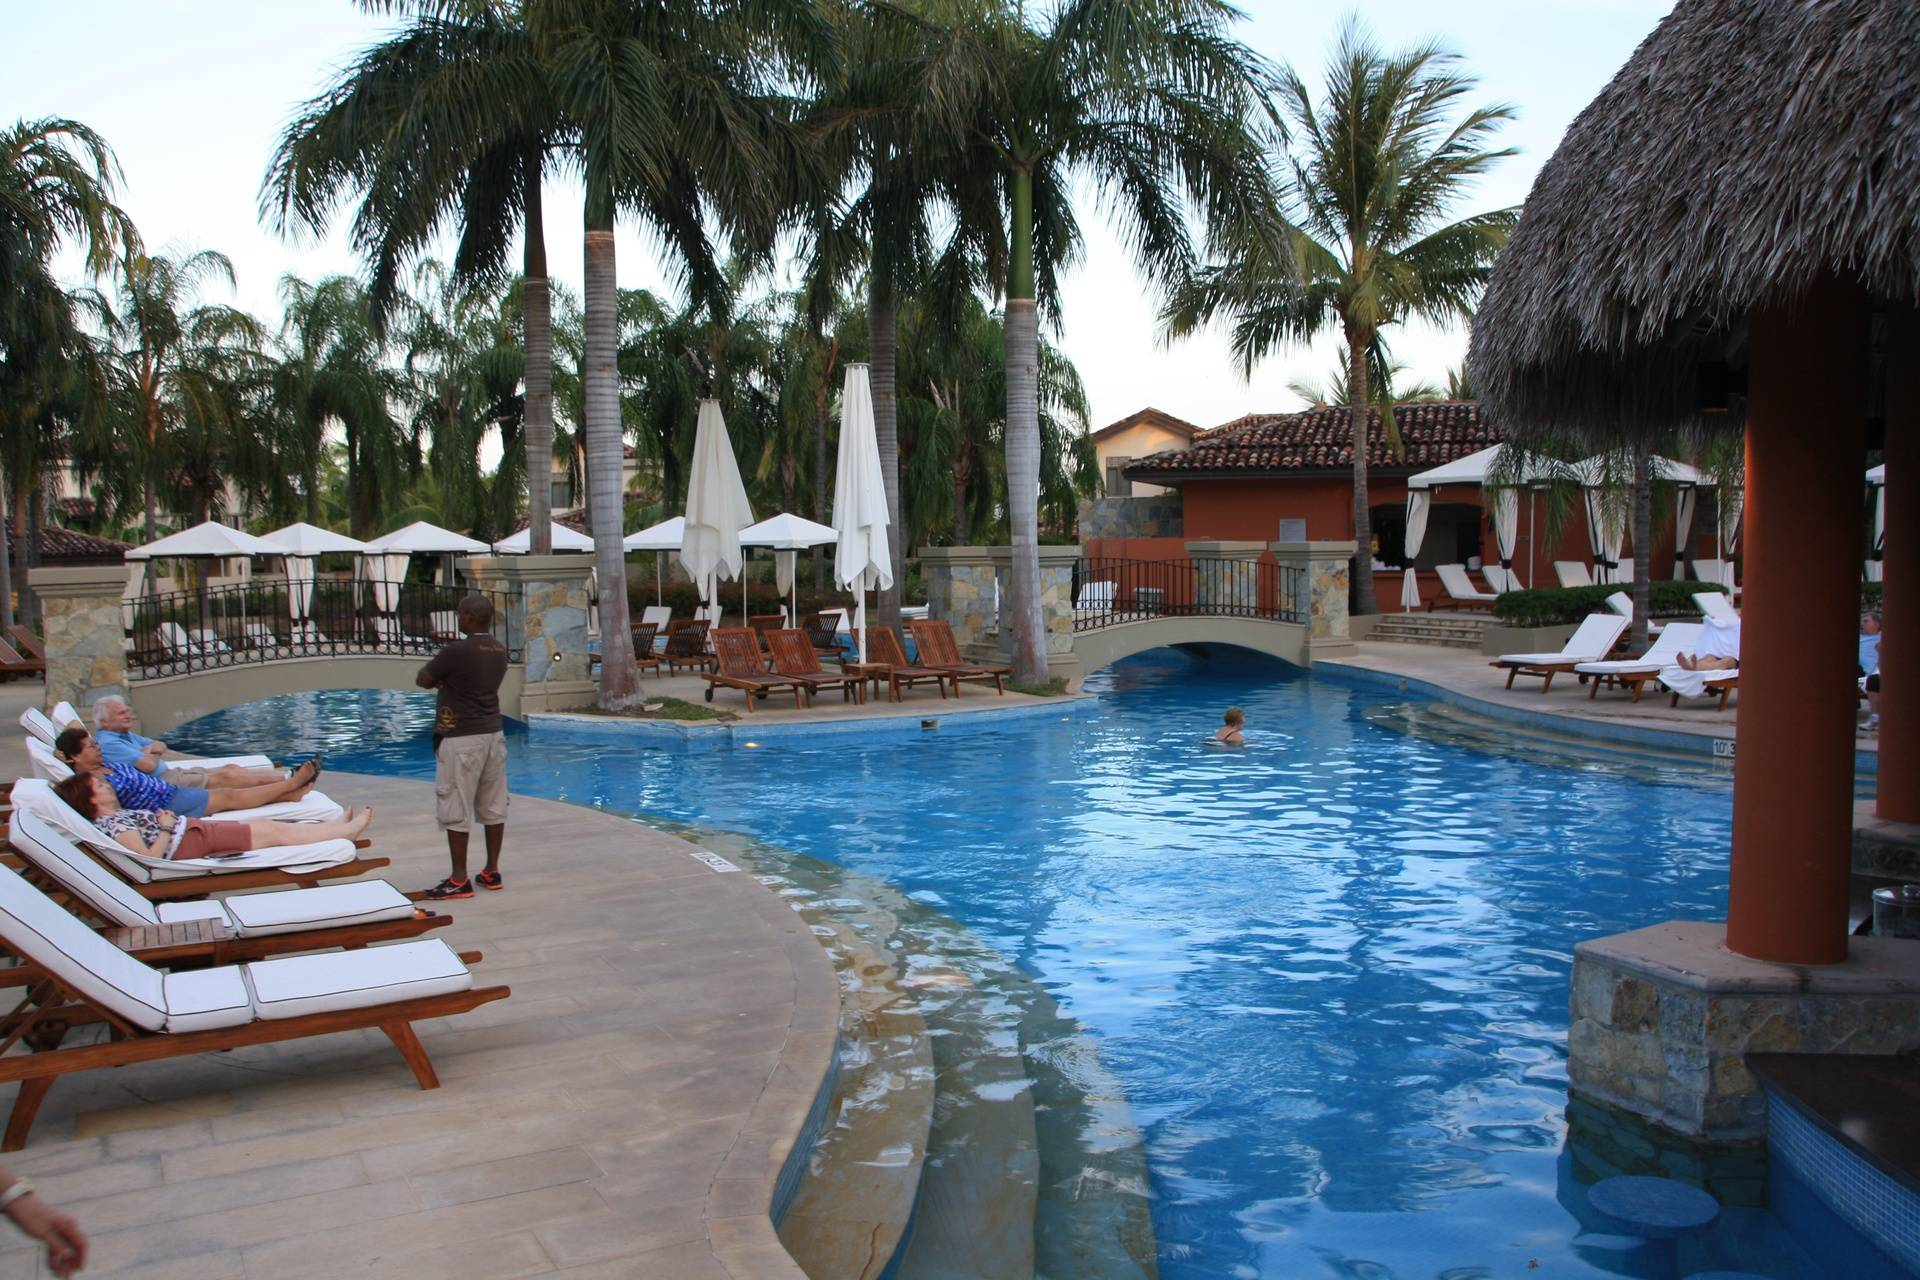 JW Marriott Hotel in Playa Banca